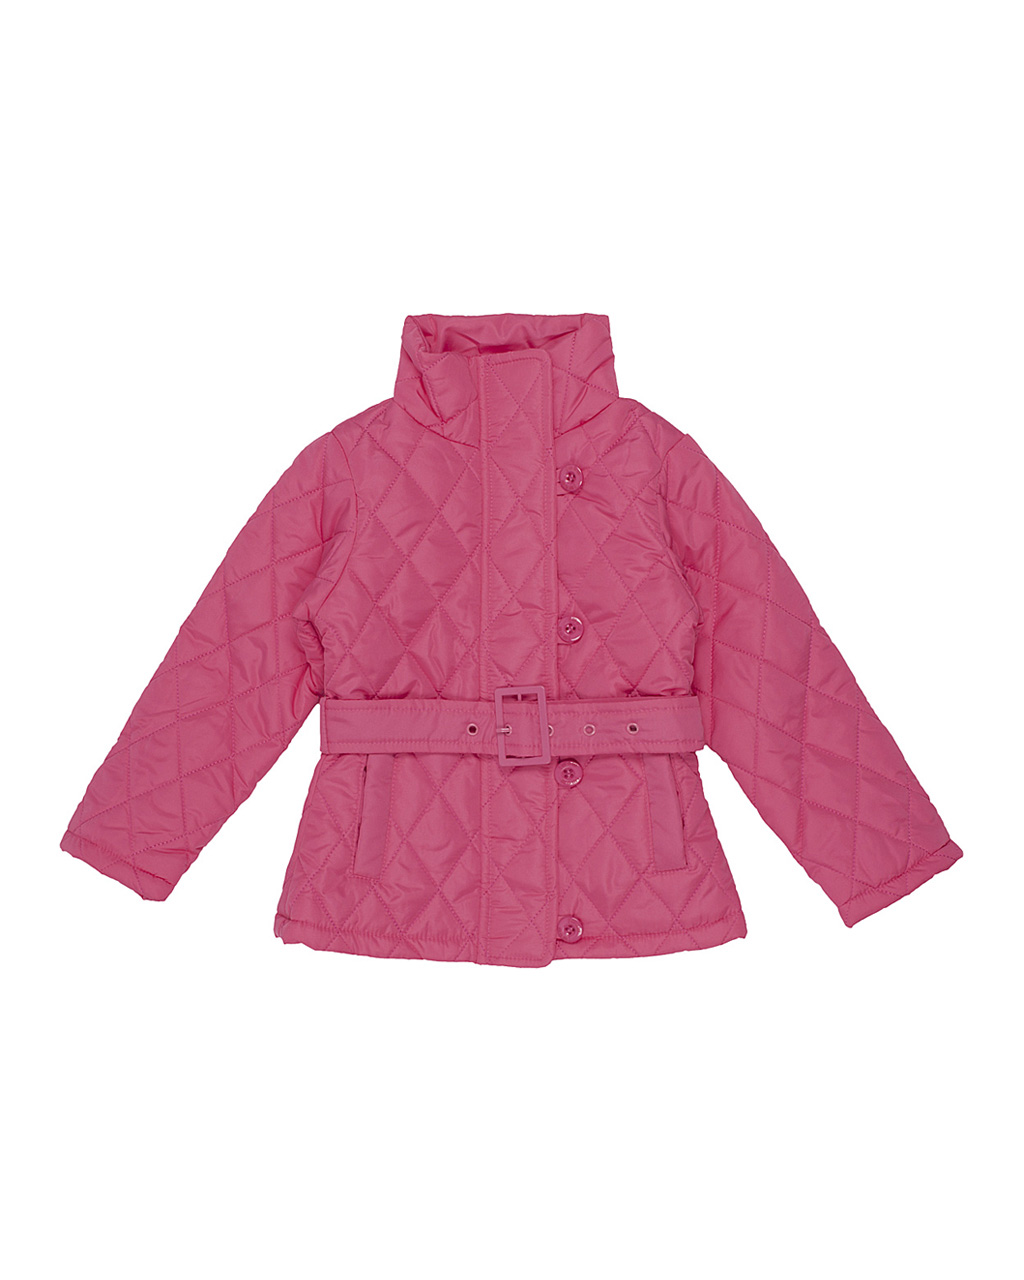 Casaco Infantil Matelassê Rosa Neon Momi